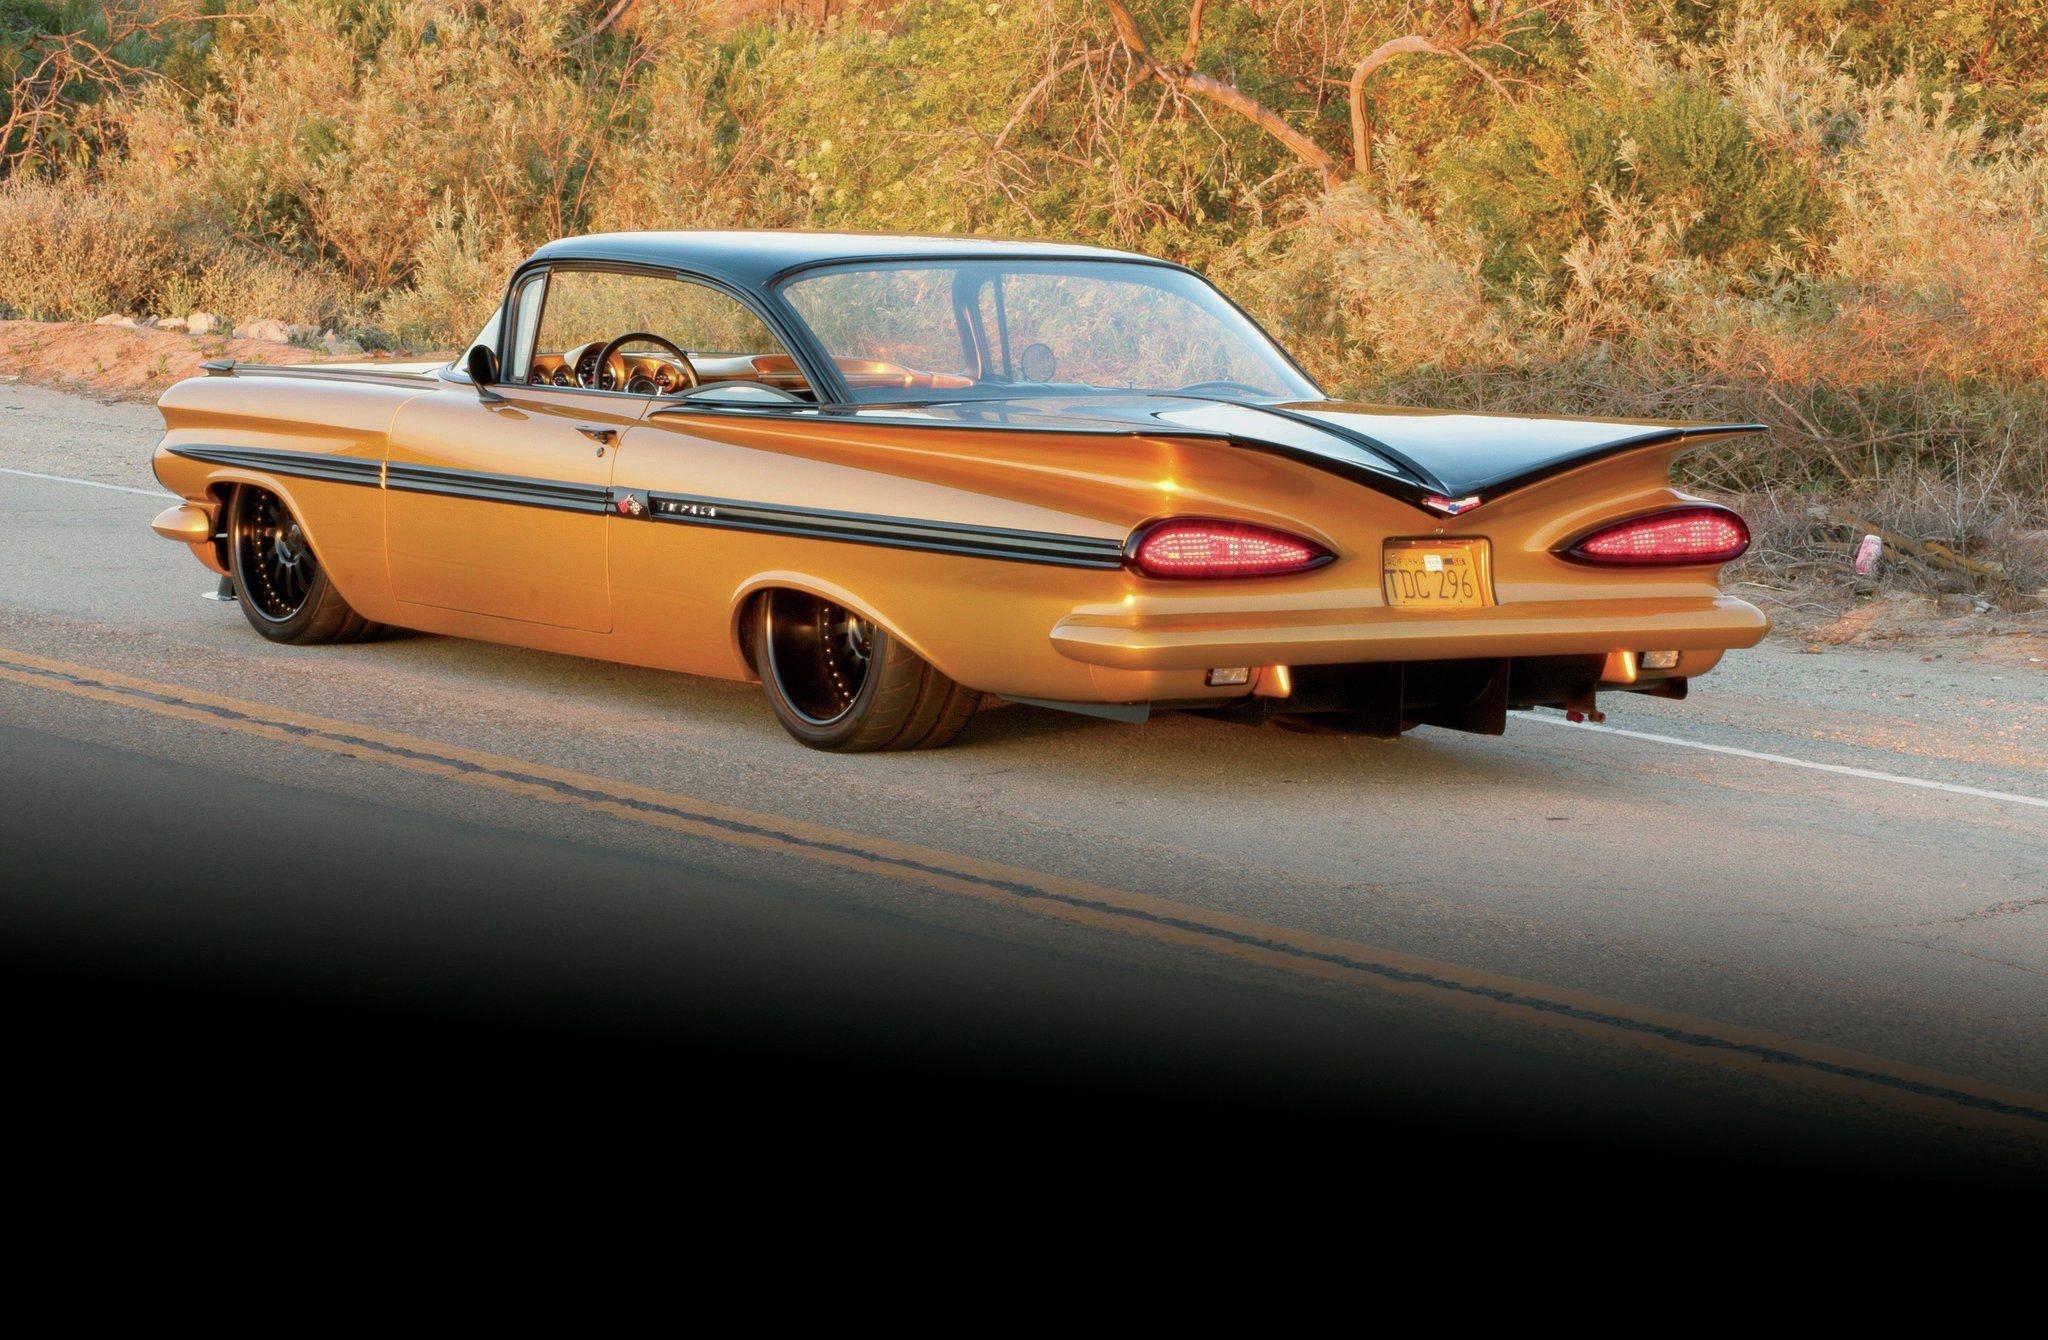 1959 Chevrolet Impala Hardtop-02 wallpaper